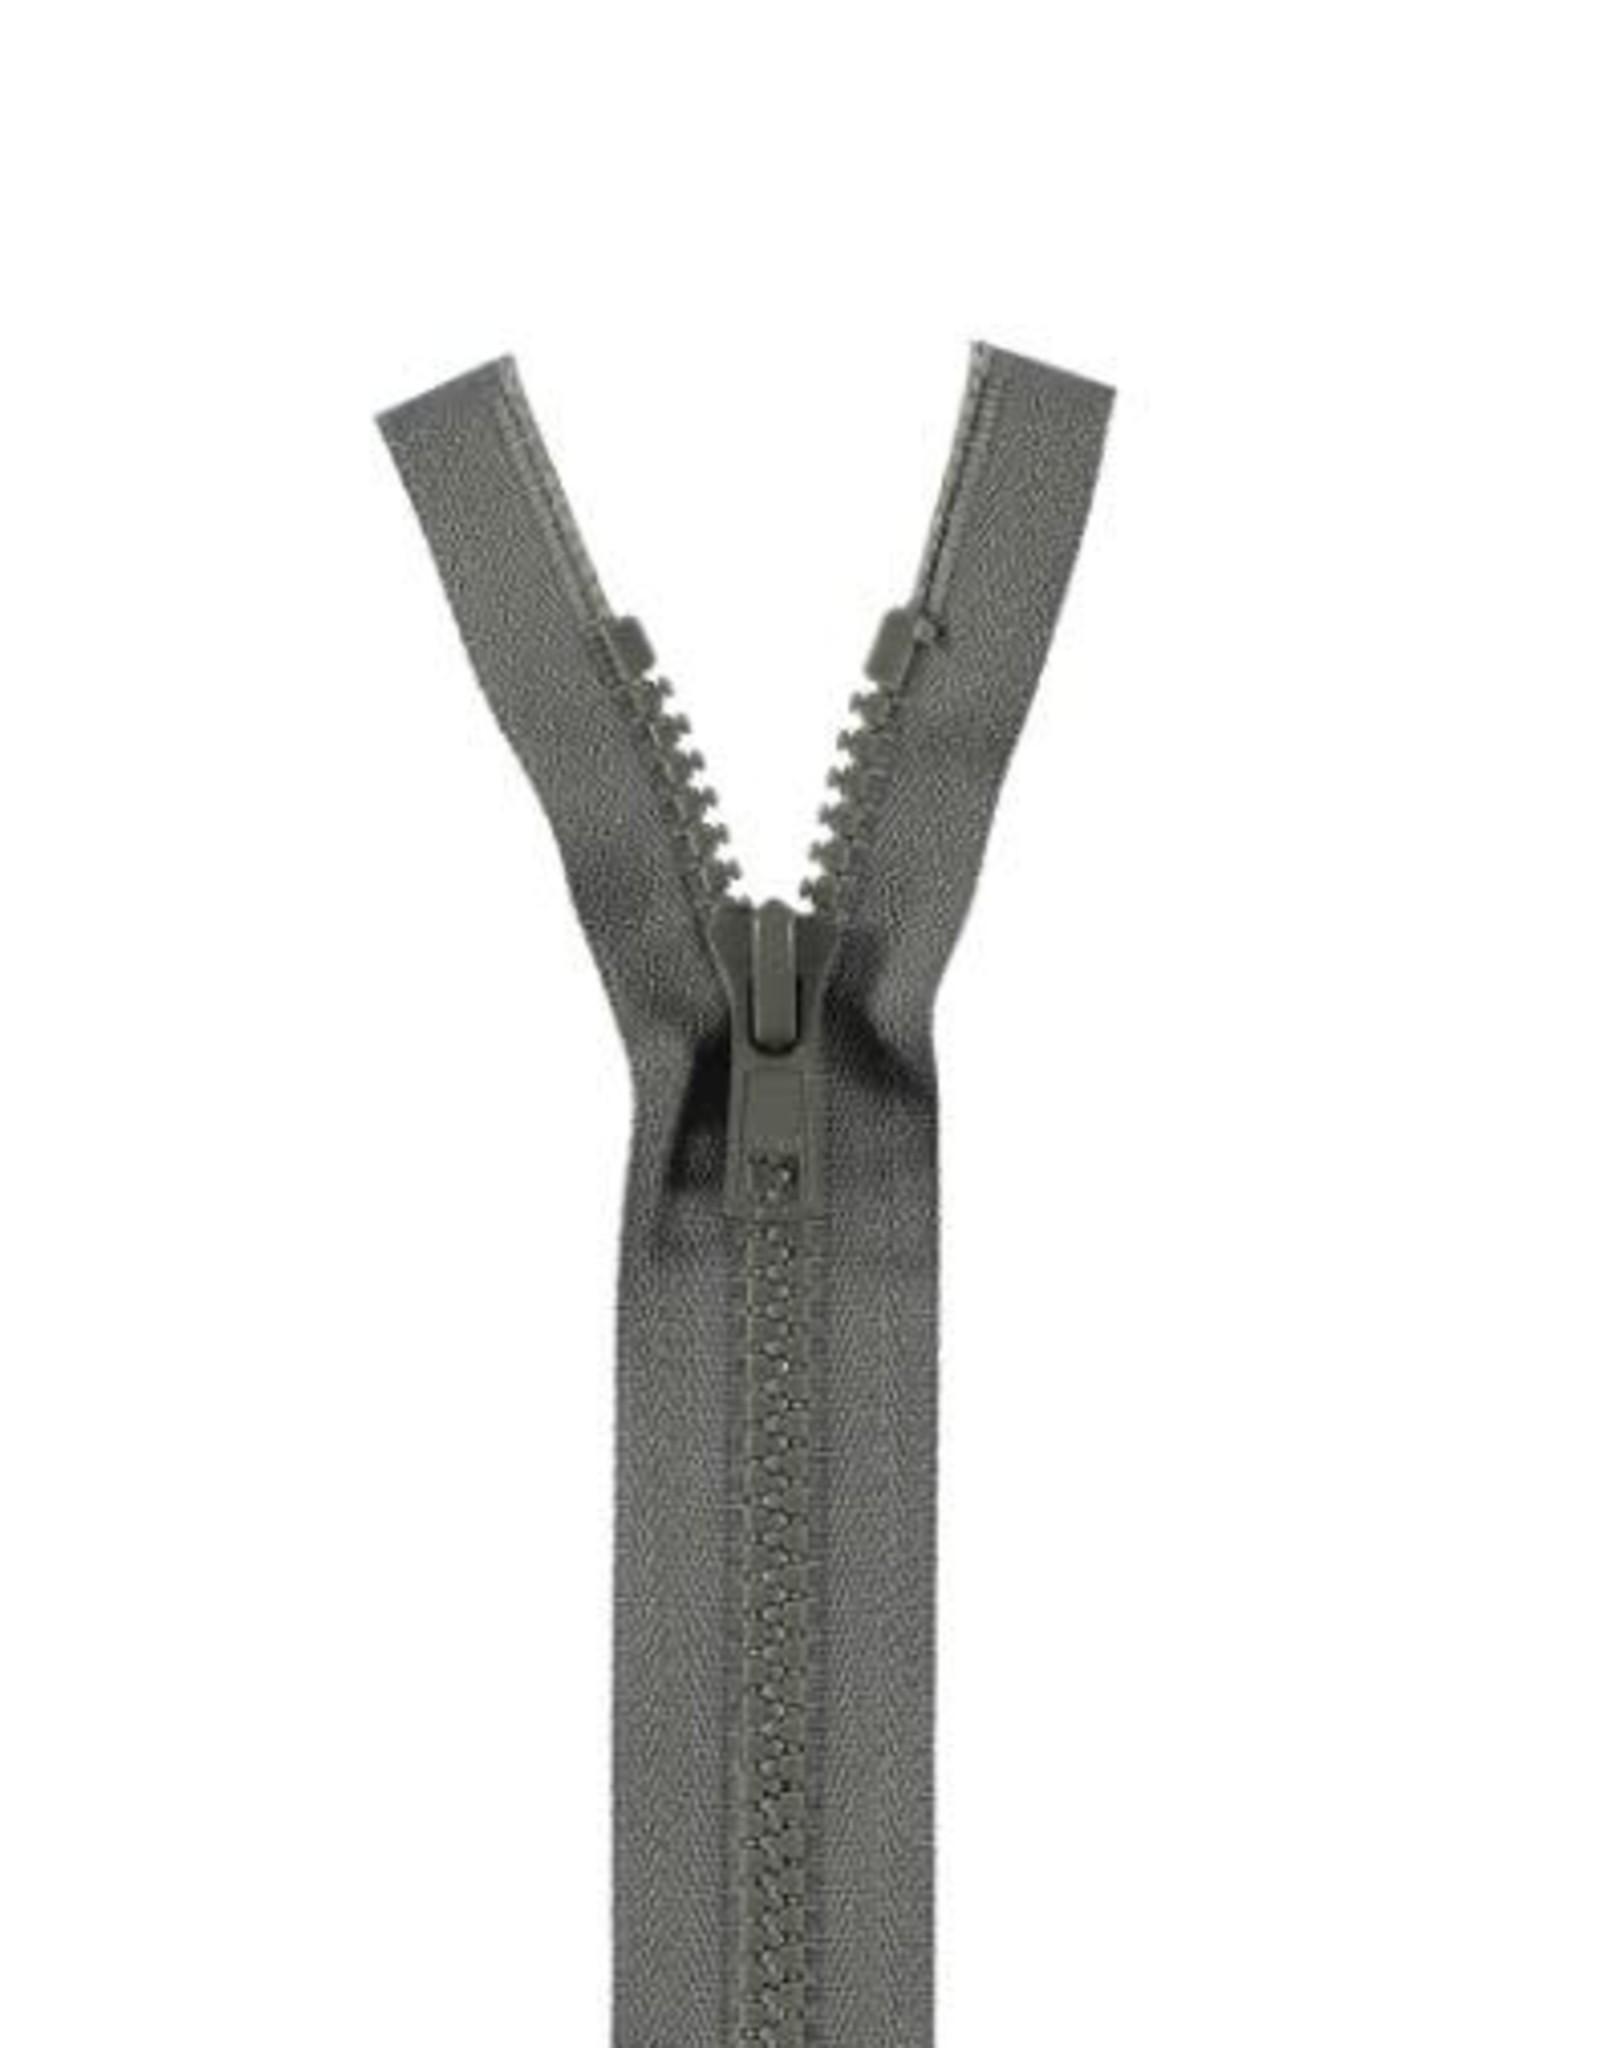 YKK BLOKRITS 5 DEELBAAR grijs 578-35cm